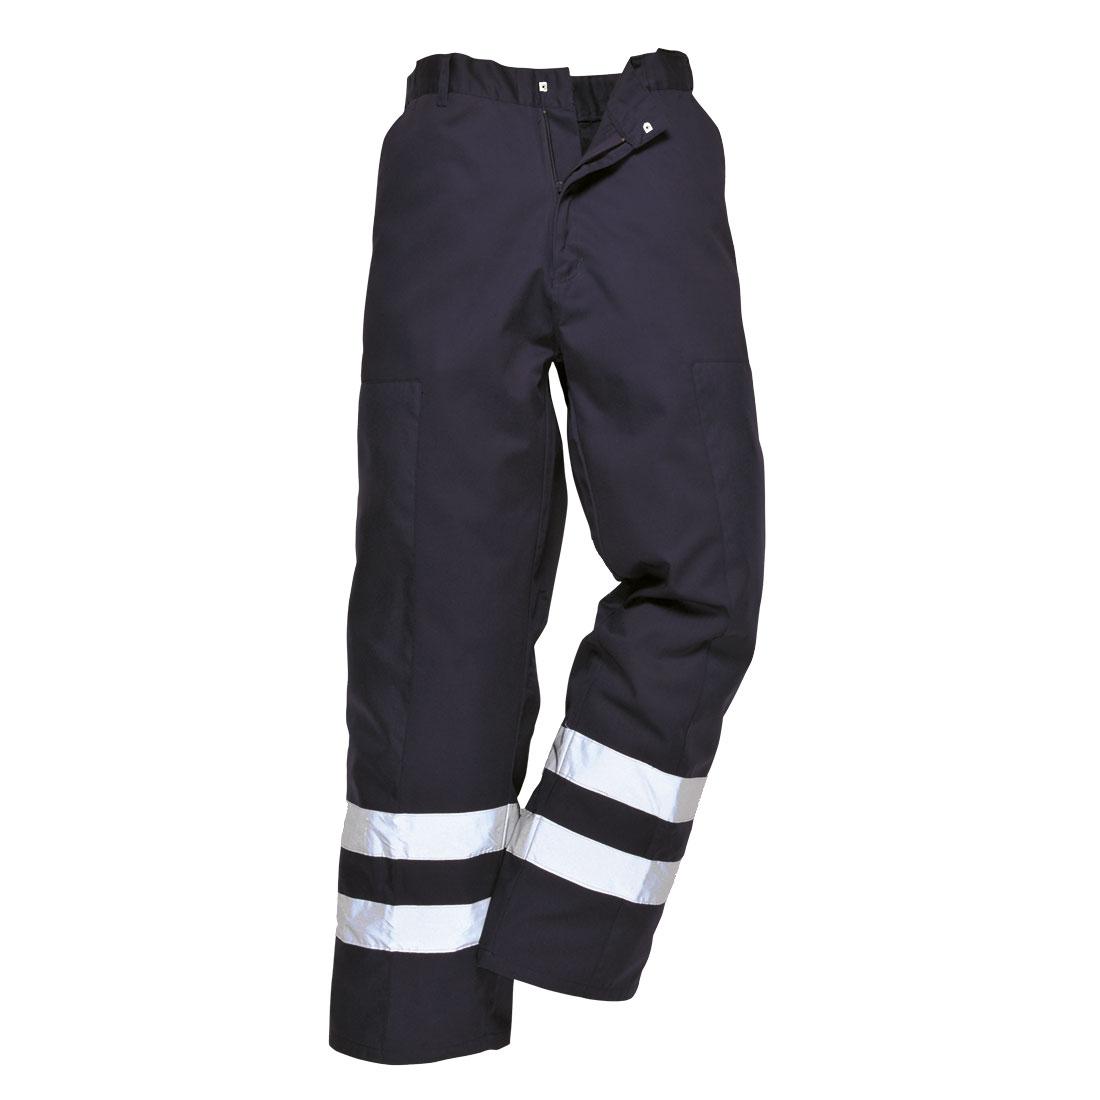 Ballistic Trousers Black XXLR